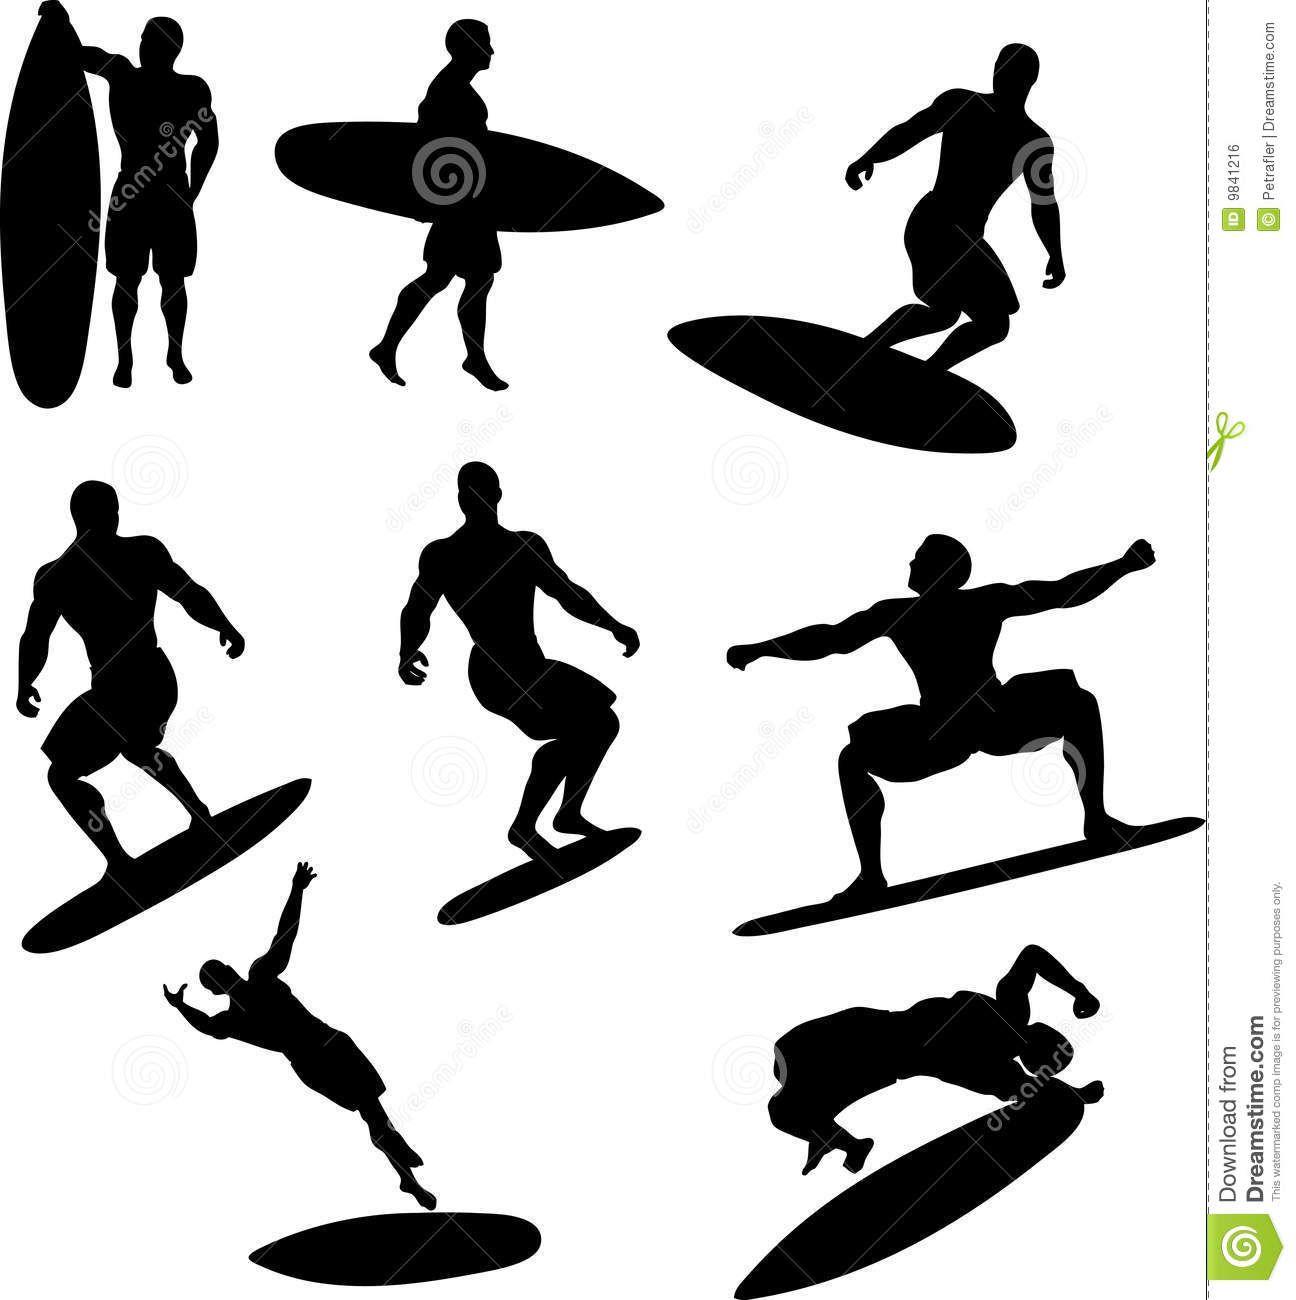 1296x1300 Surfer Silhouette